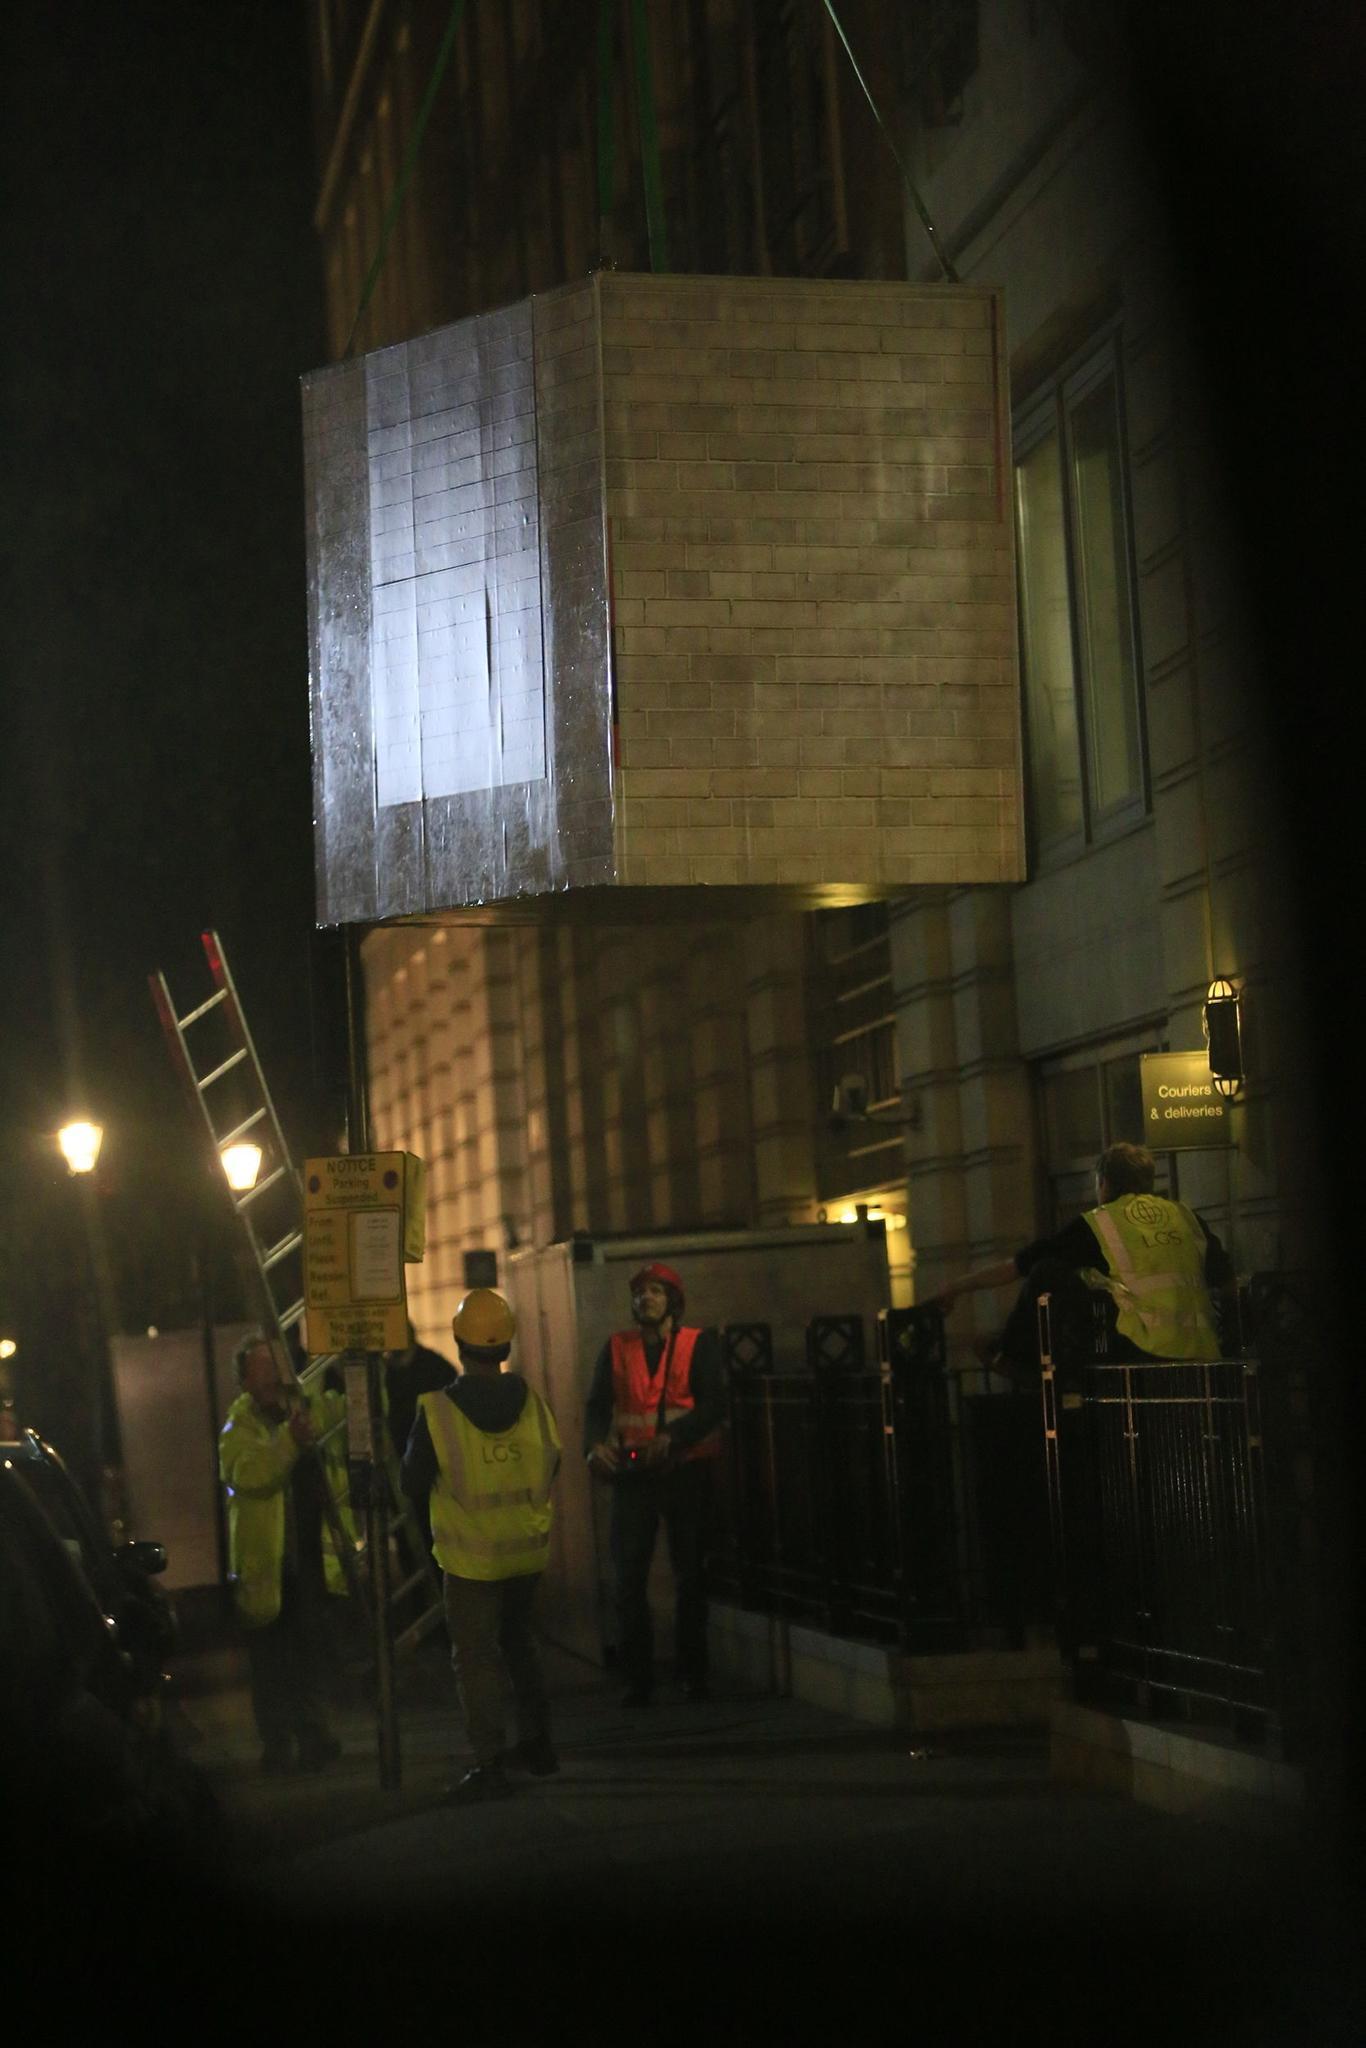 BP's London headquarters blockaded by Greenpeace climate change